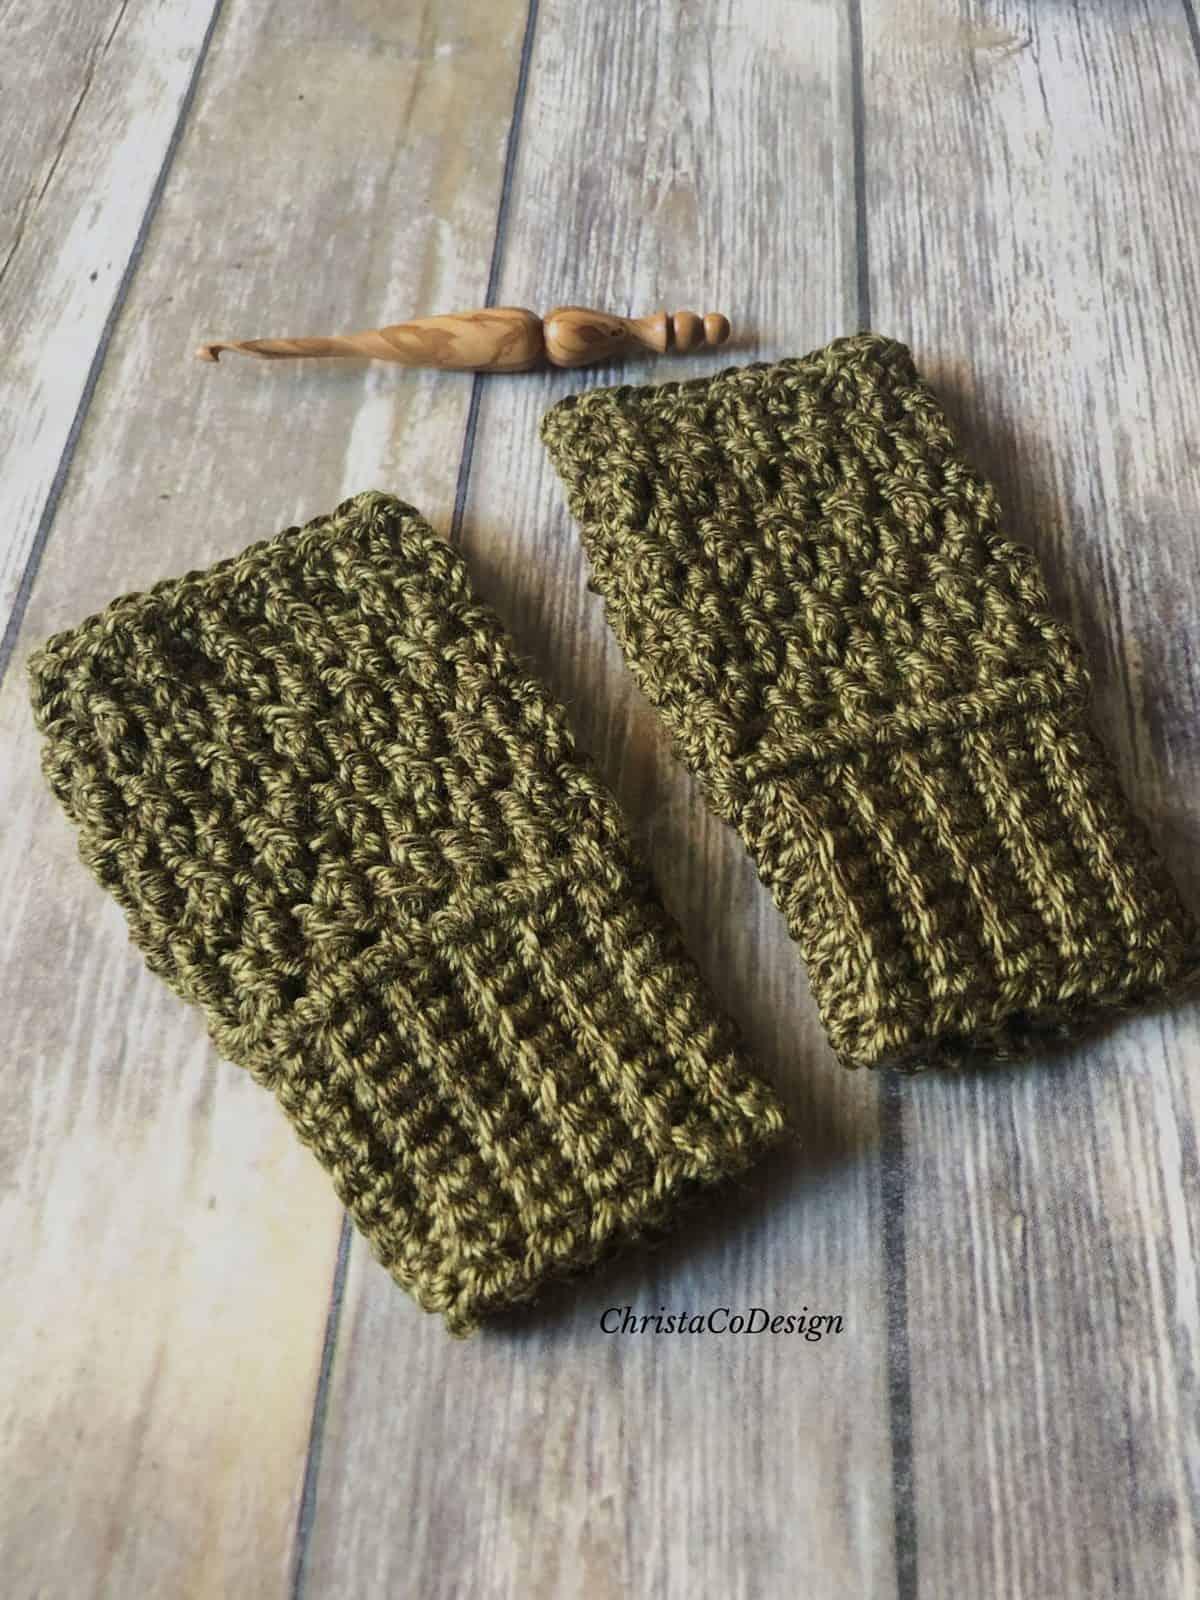 picture of dark green crochet fingerless gloves on wood floor with wood crochet hook